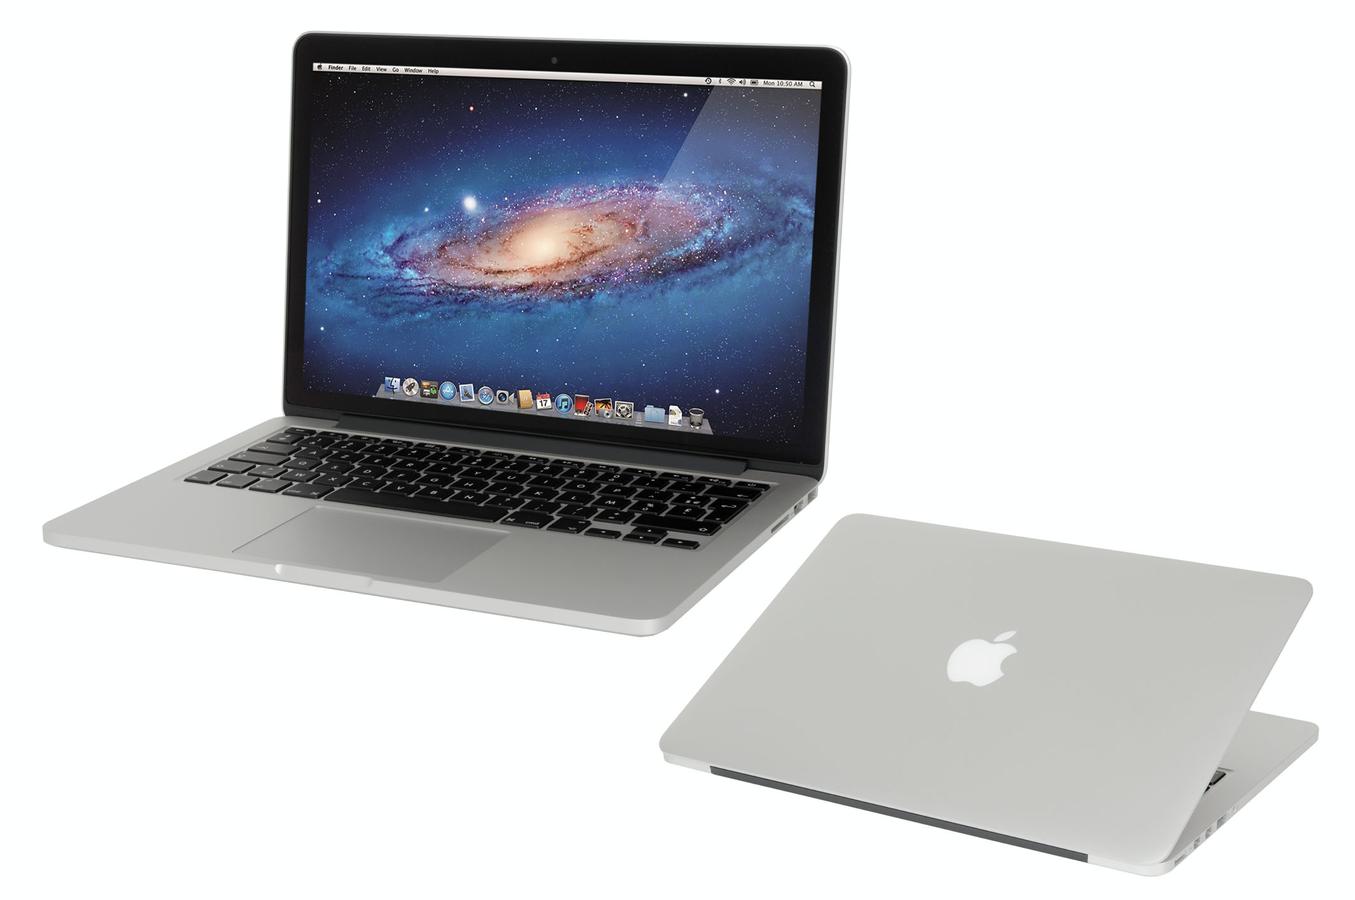 macbook apple macbook pro retina 13 3 me662f 2 6ghz. Black Bedroom Furniture Sets. Home Design Ideas